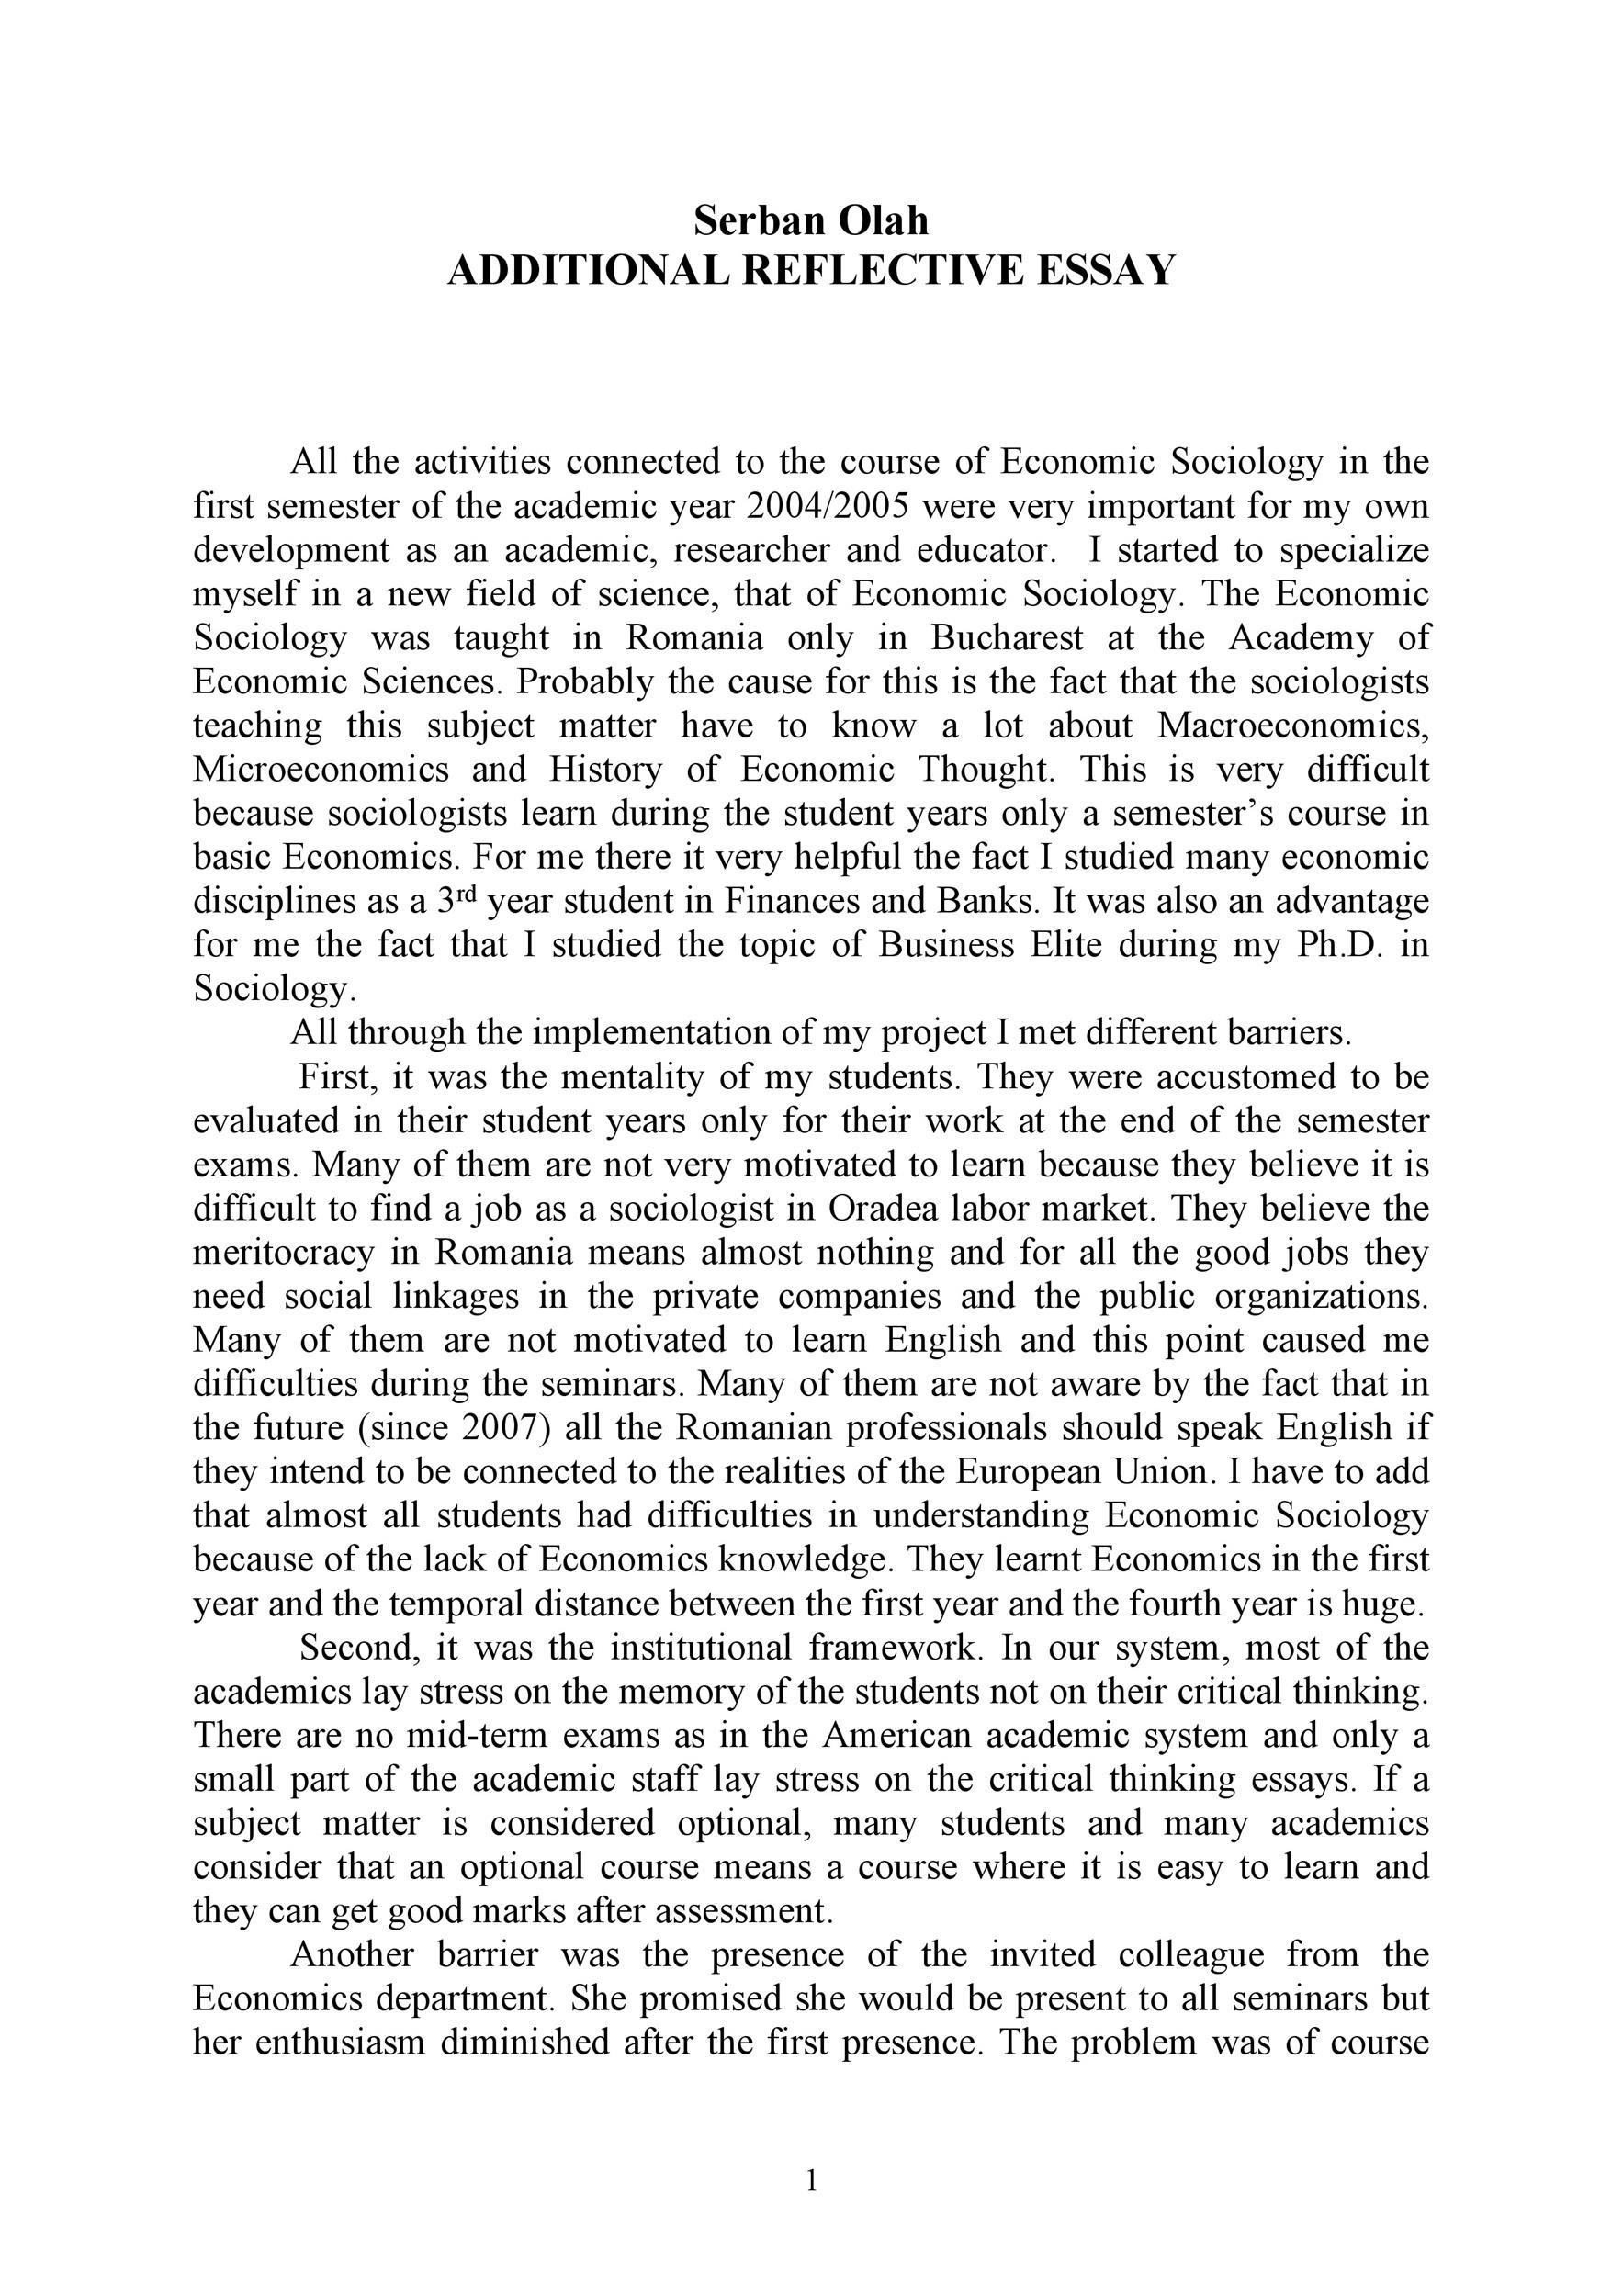 Free reflective essay example 25